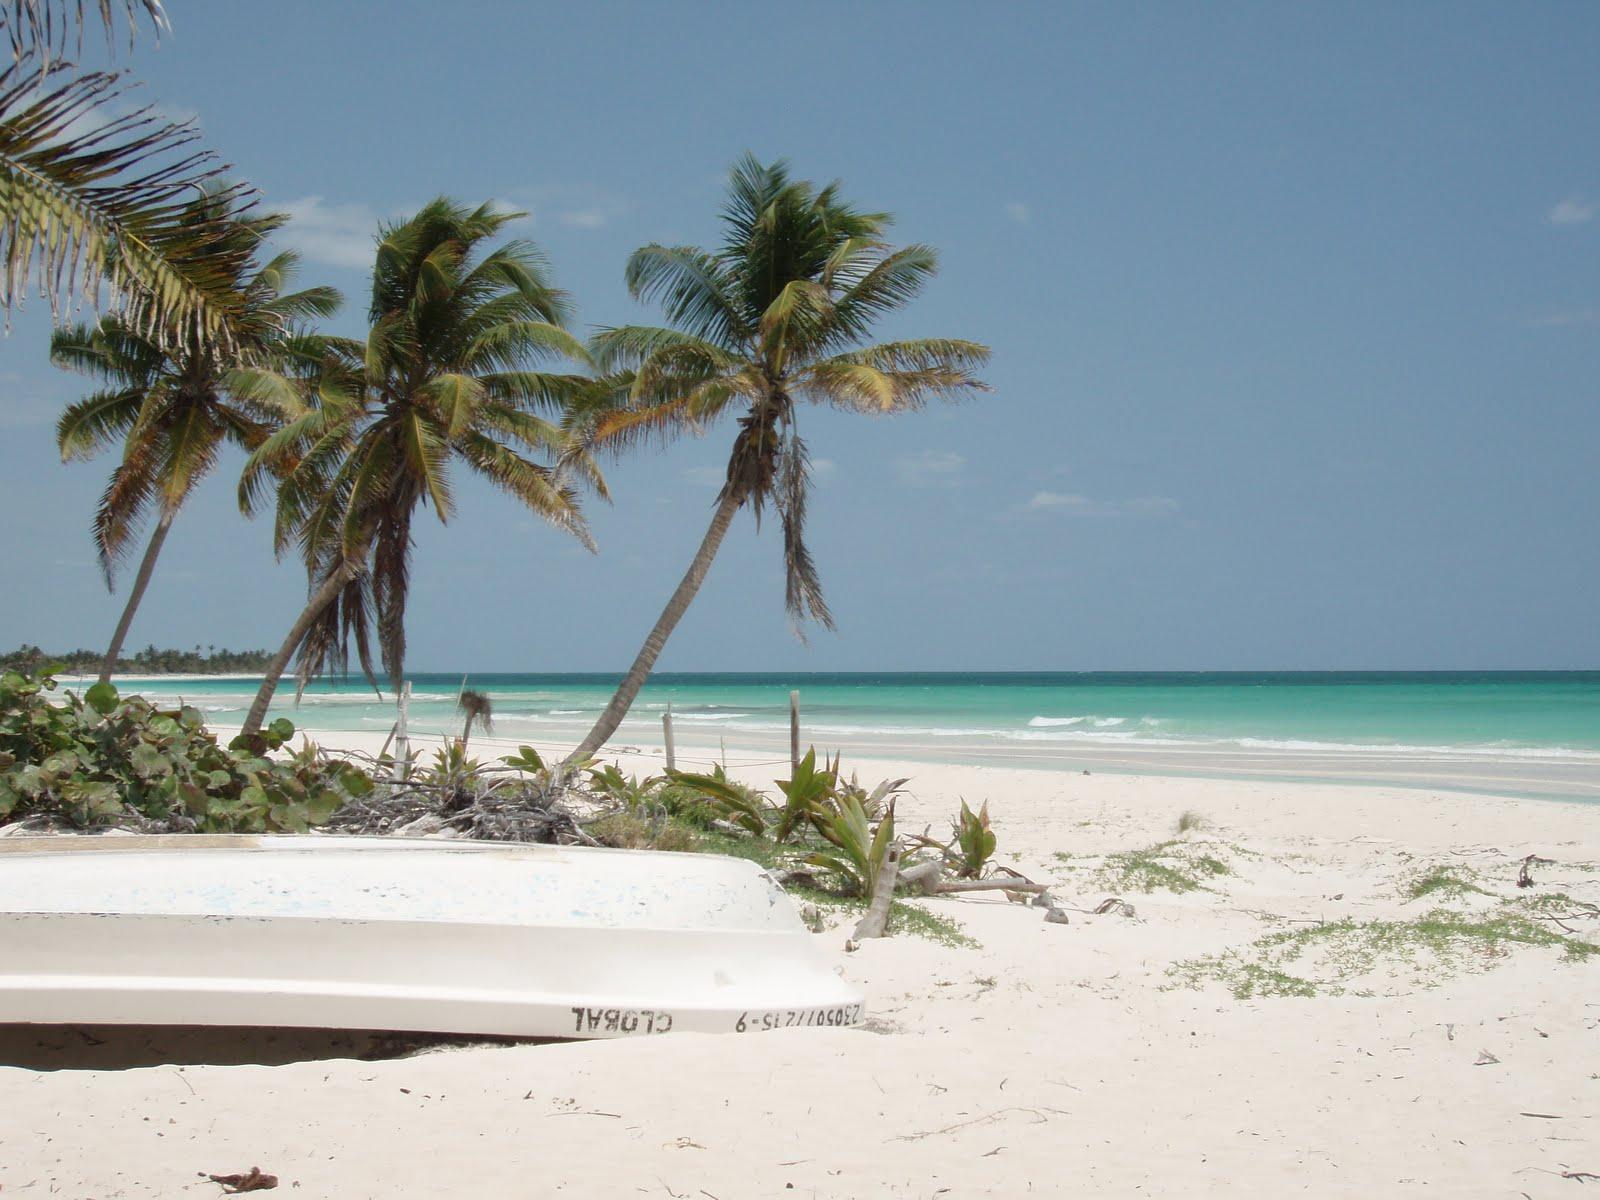 Playa Del Carmen, Mexico – Tourist Destinations